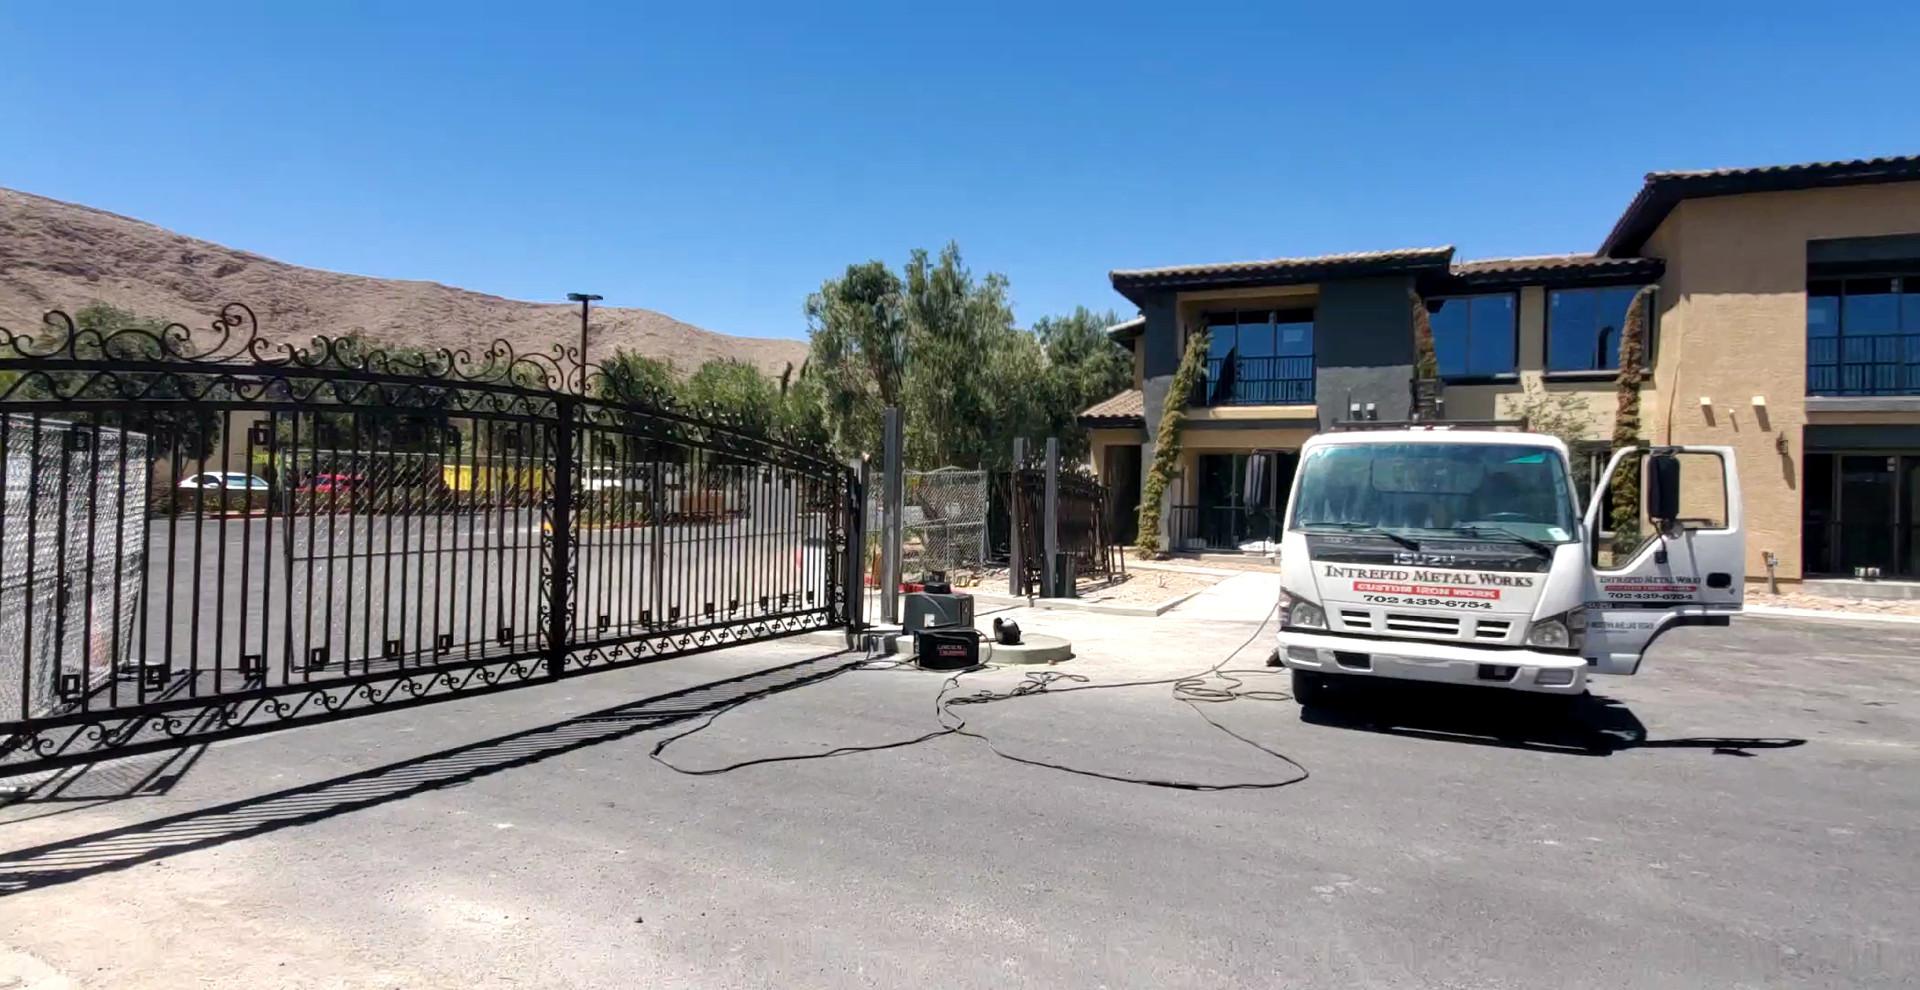 Entry Gates Las Vegas - Intrepid Metal Works Inc.